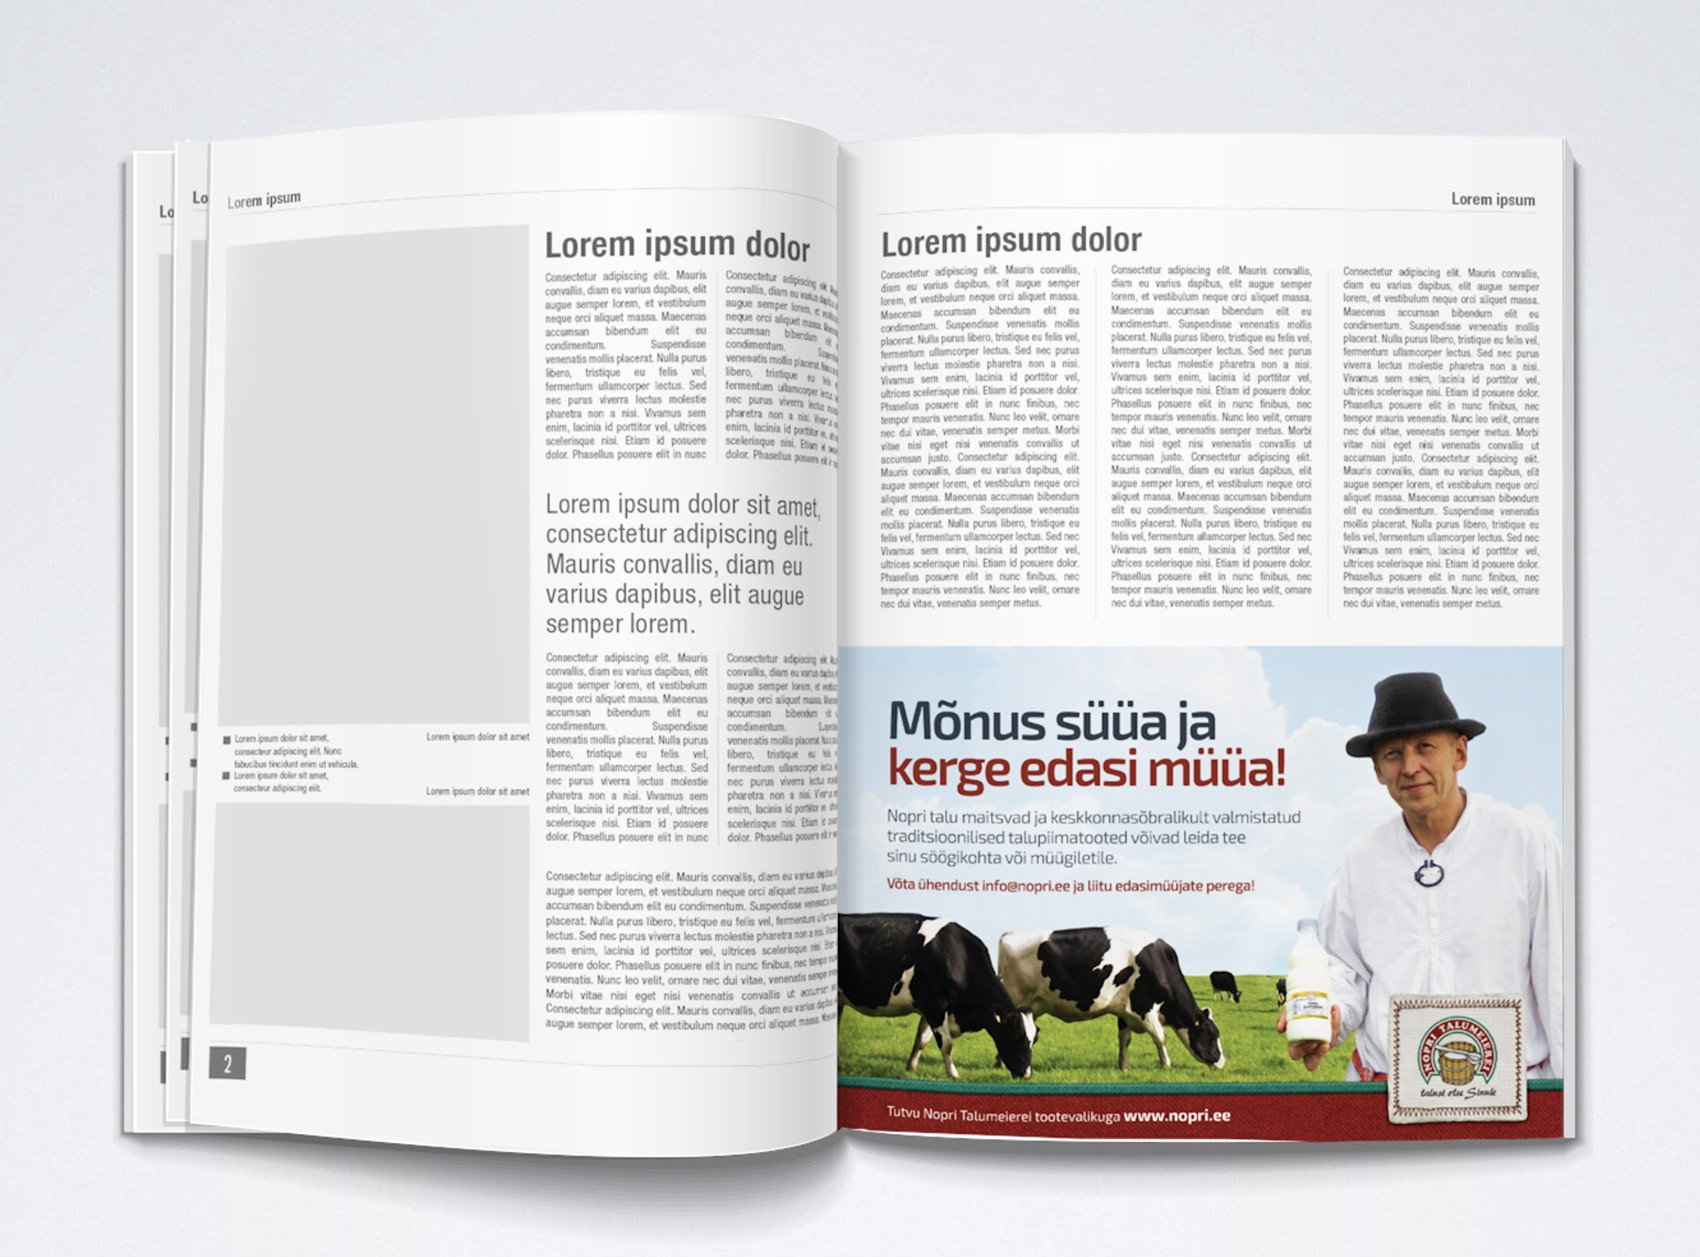 Print ad: Nopri